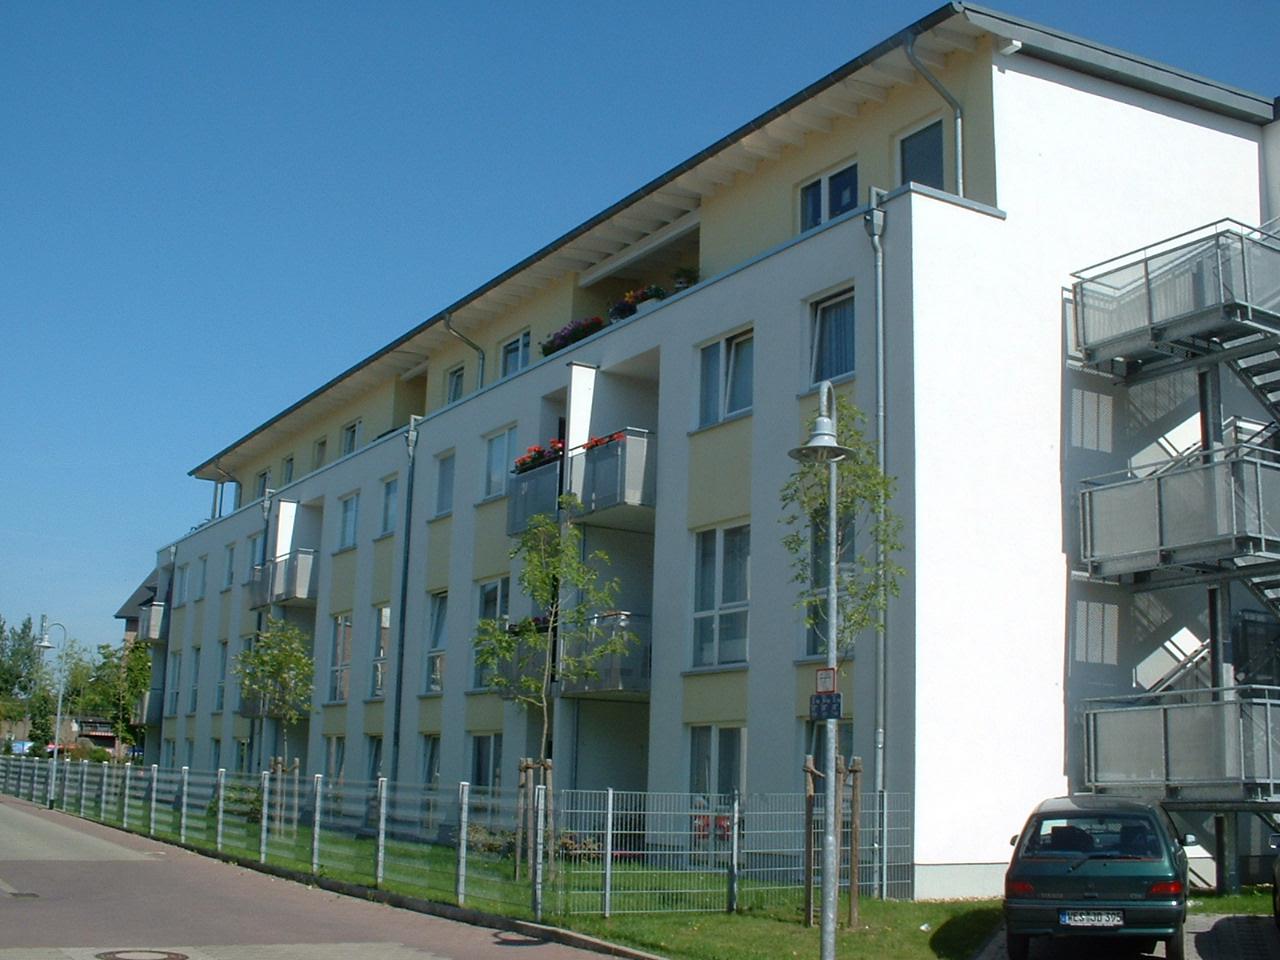 Hausverwaltung Krefeld - Antoniastraße - Mietverwalter